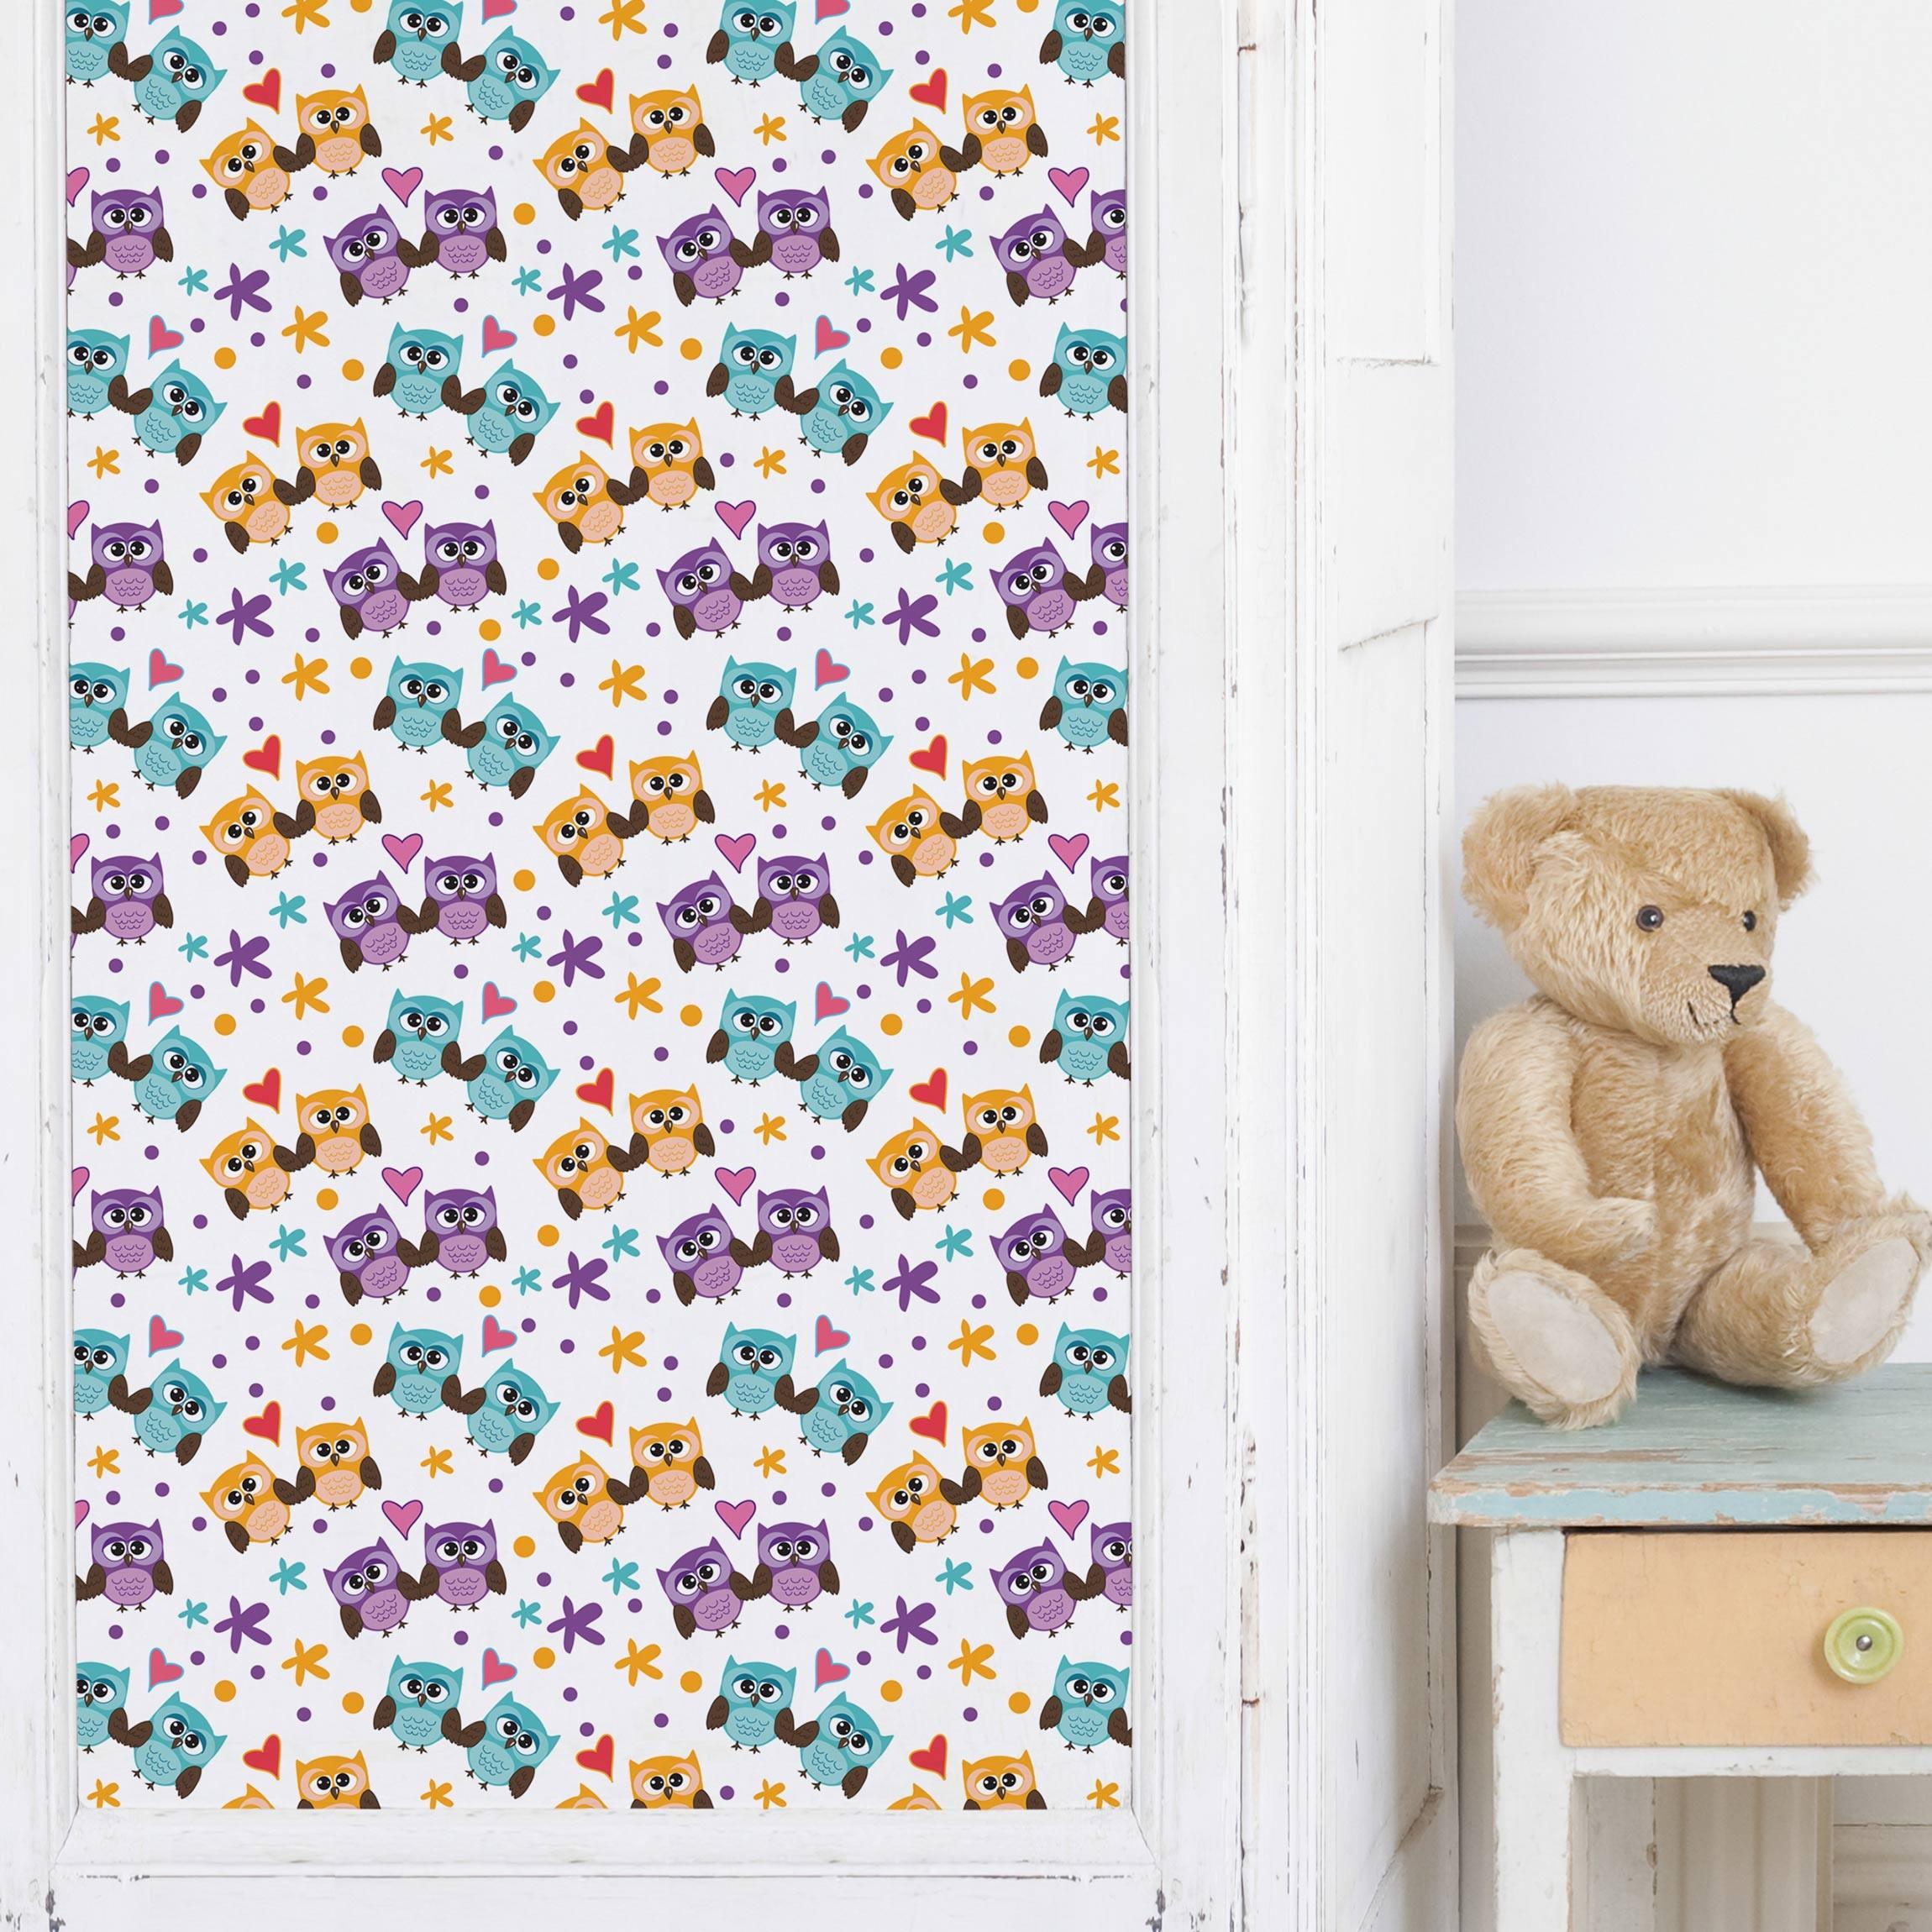 Carta adesiva per mobili sweet child pattern with love owls - Carta per ricoprire mobili ...